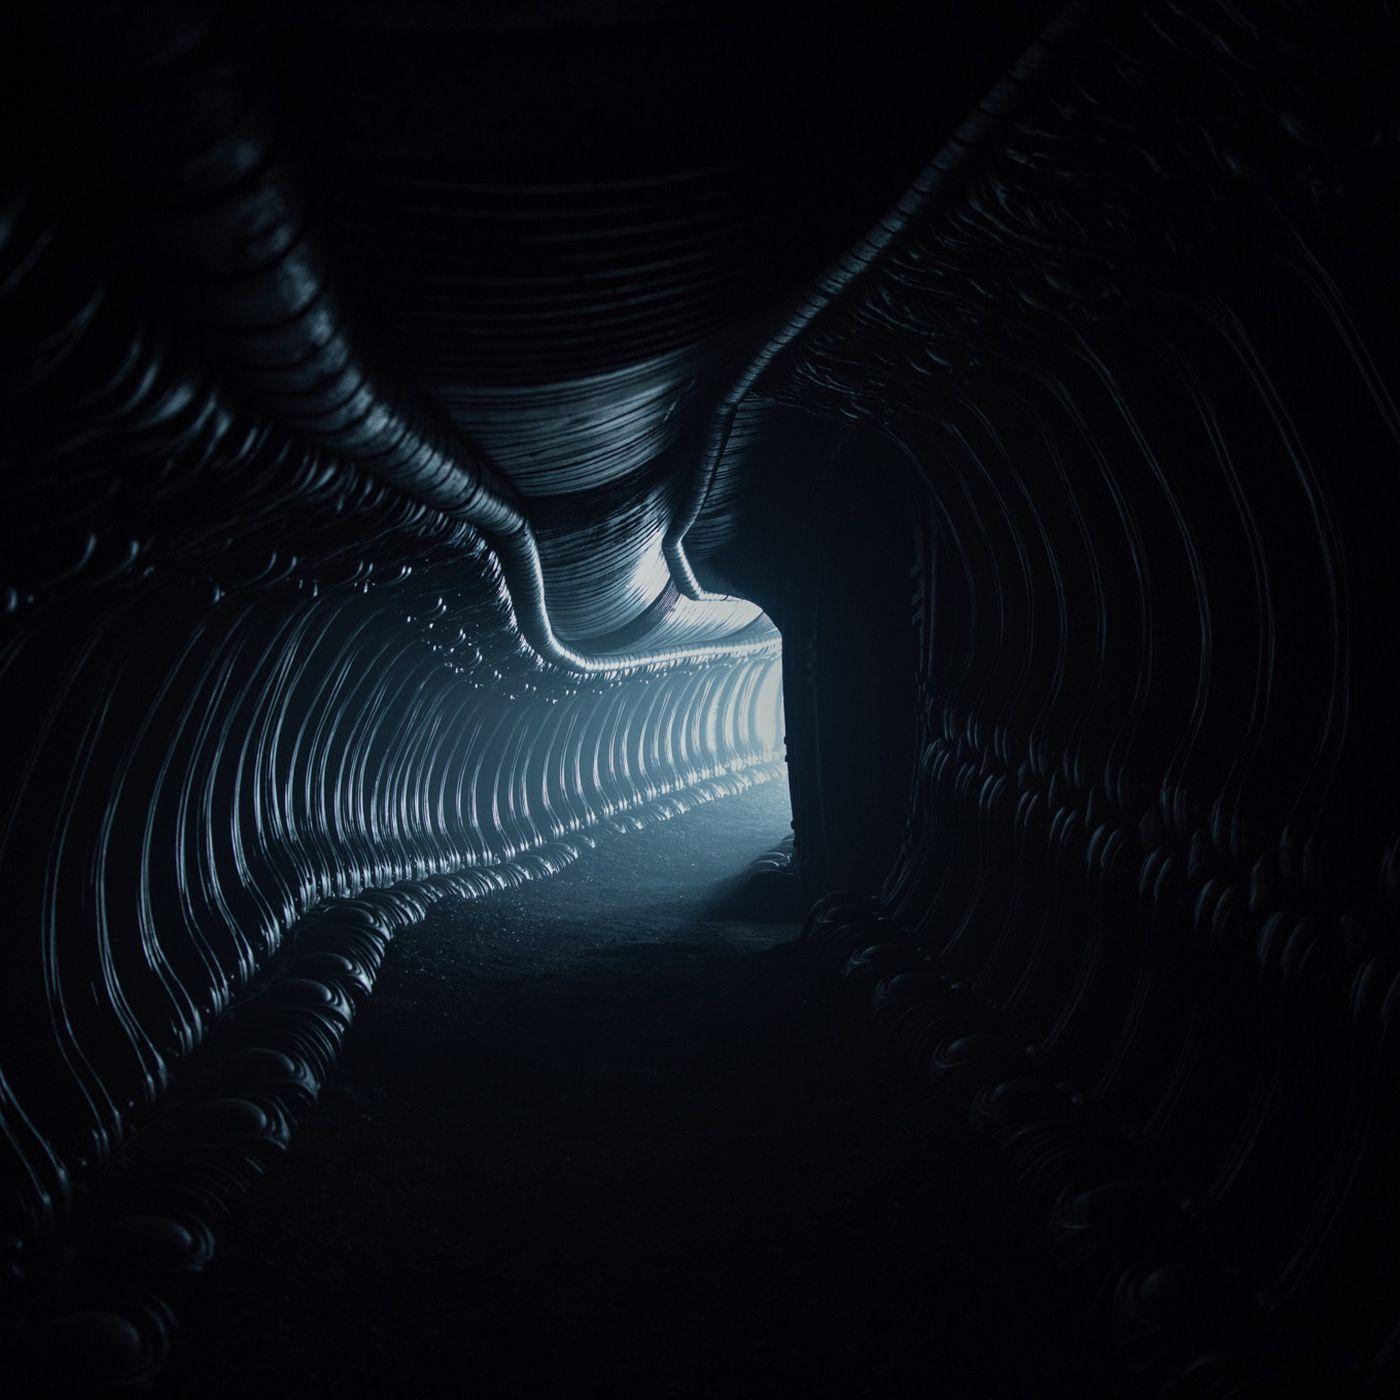 For Alien Day, Alexa will help you escape a xenomorph - The